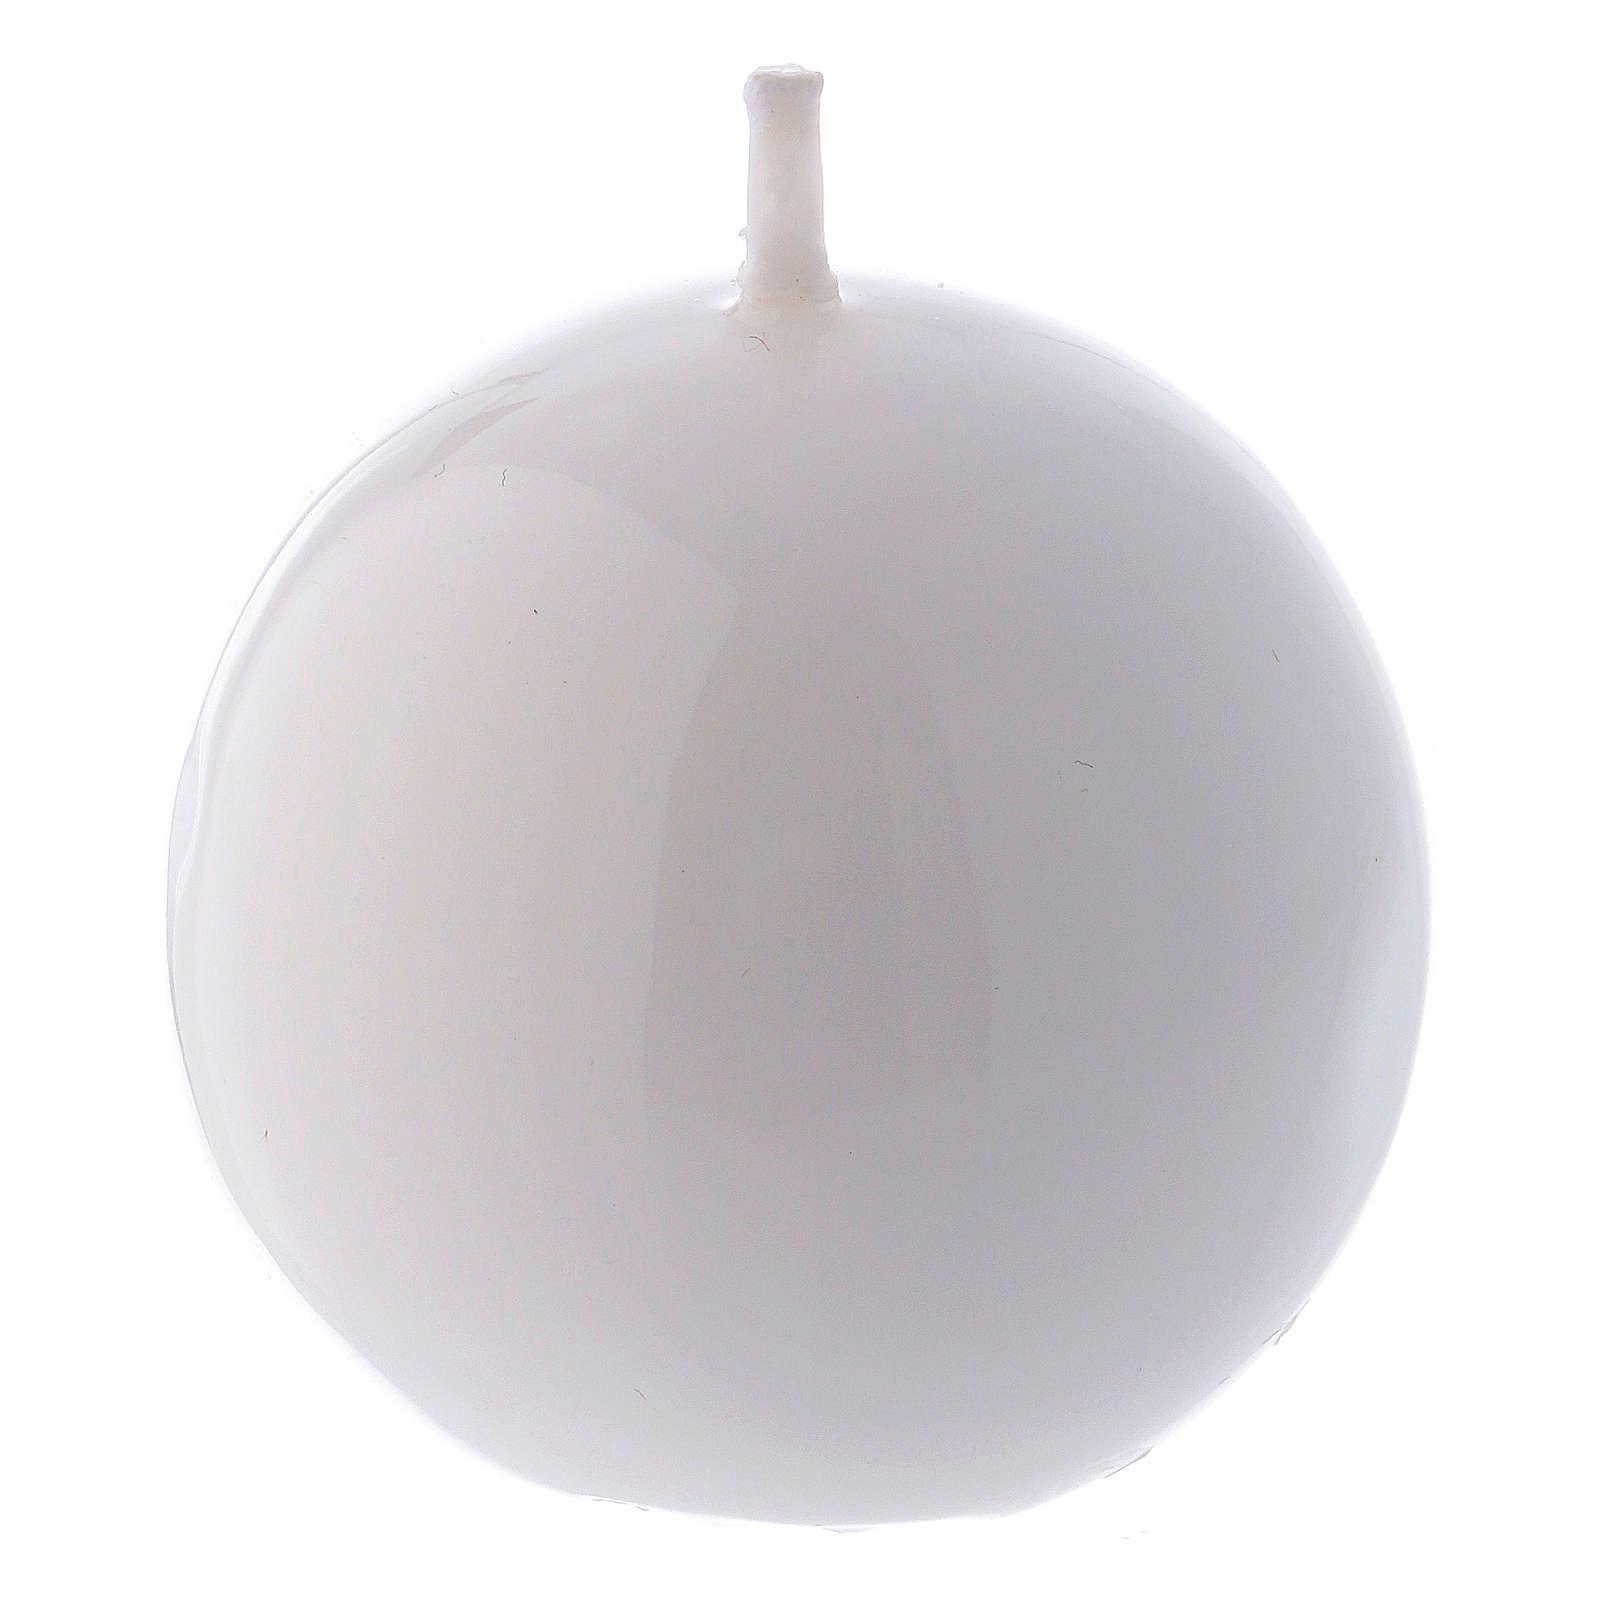 Bougie Sphère Brillante Ceralacca diam. 5 cm blanc 3